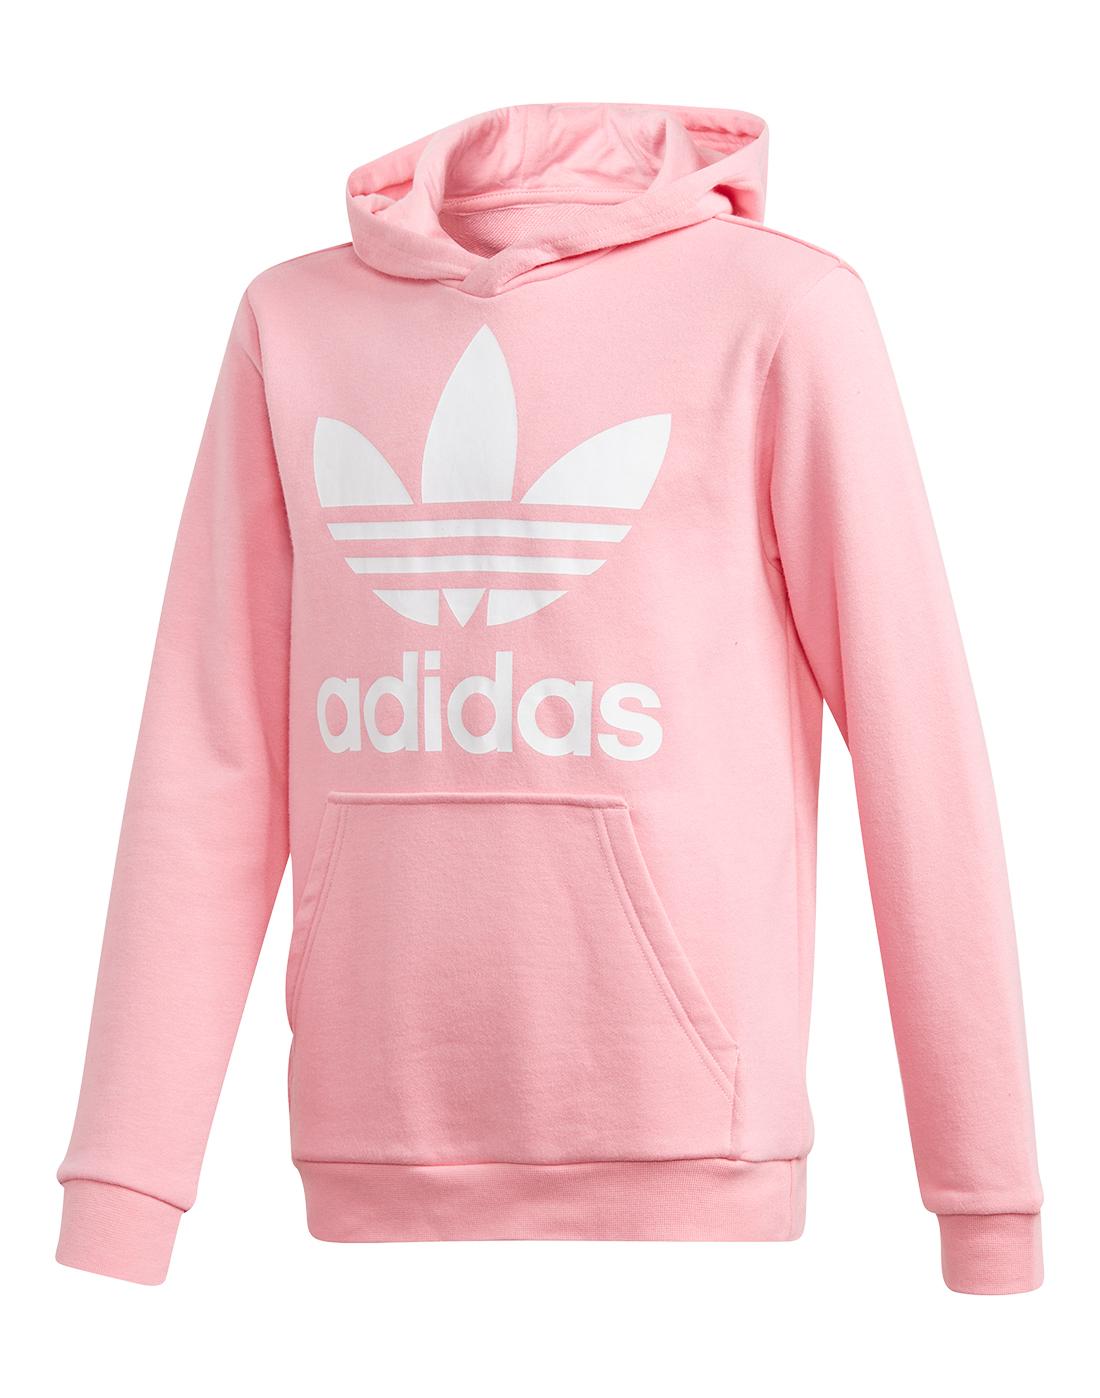 b5bcf9f9018d Girl s Pink adidas Originals Hoodie